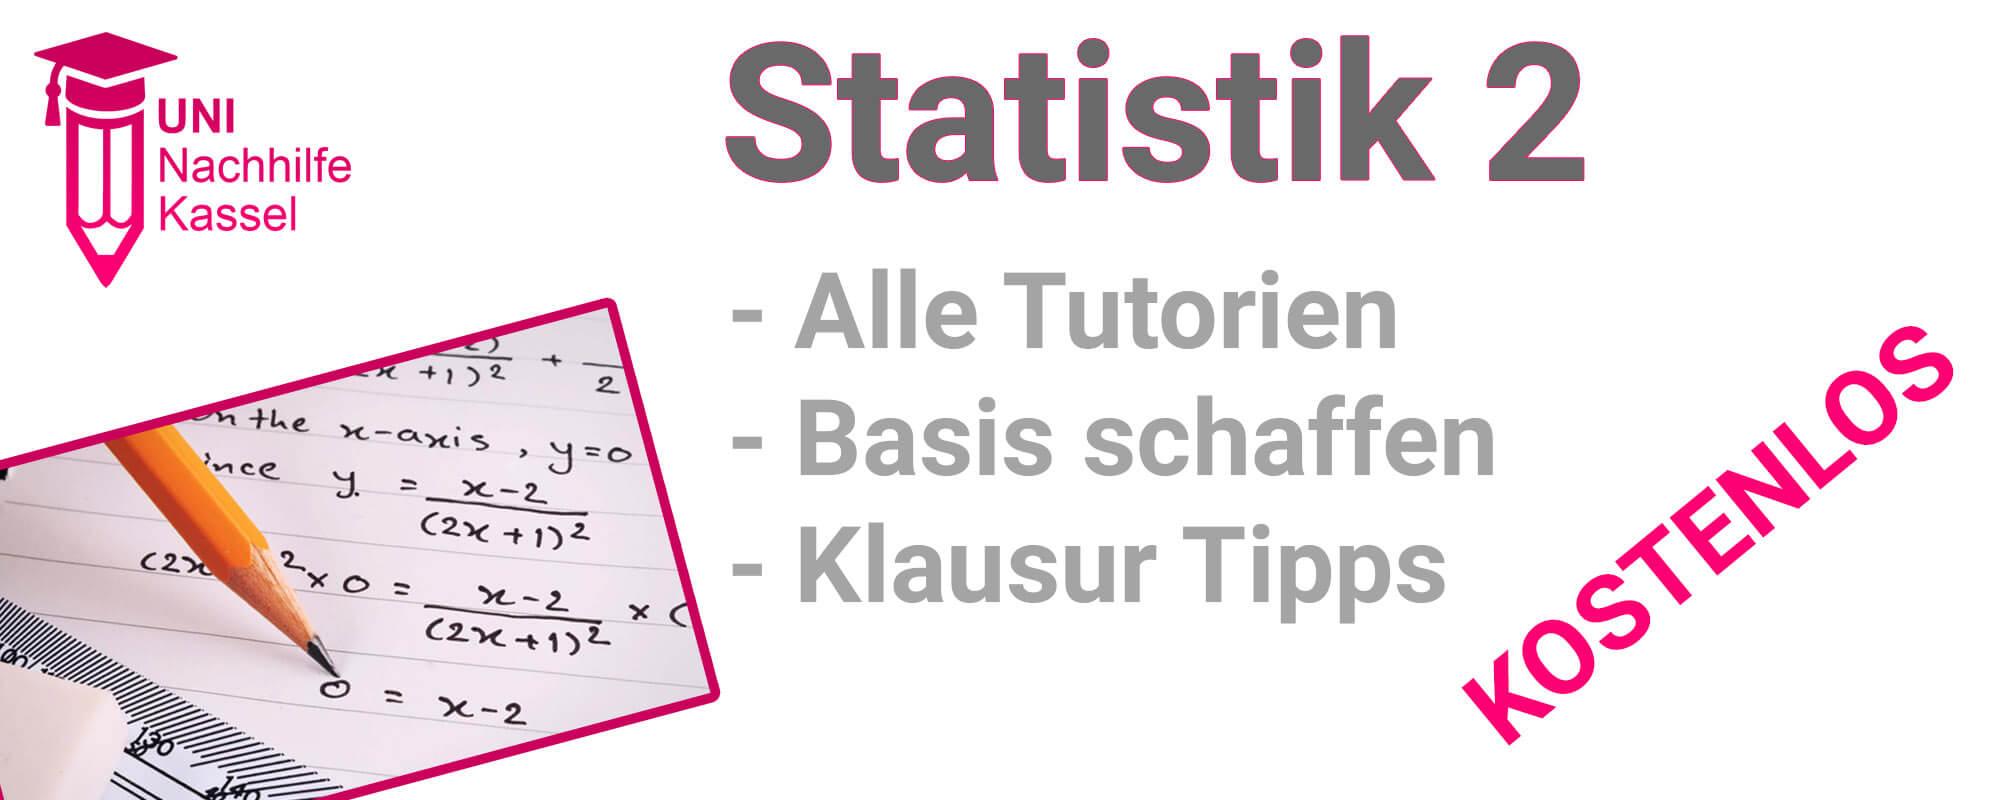 statistik 2 tutorium kostenlos sch ler uni nachhilfe kassel. Black Bedroom Furniture Sets. Home Design Ideas